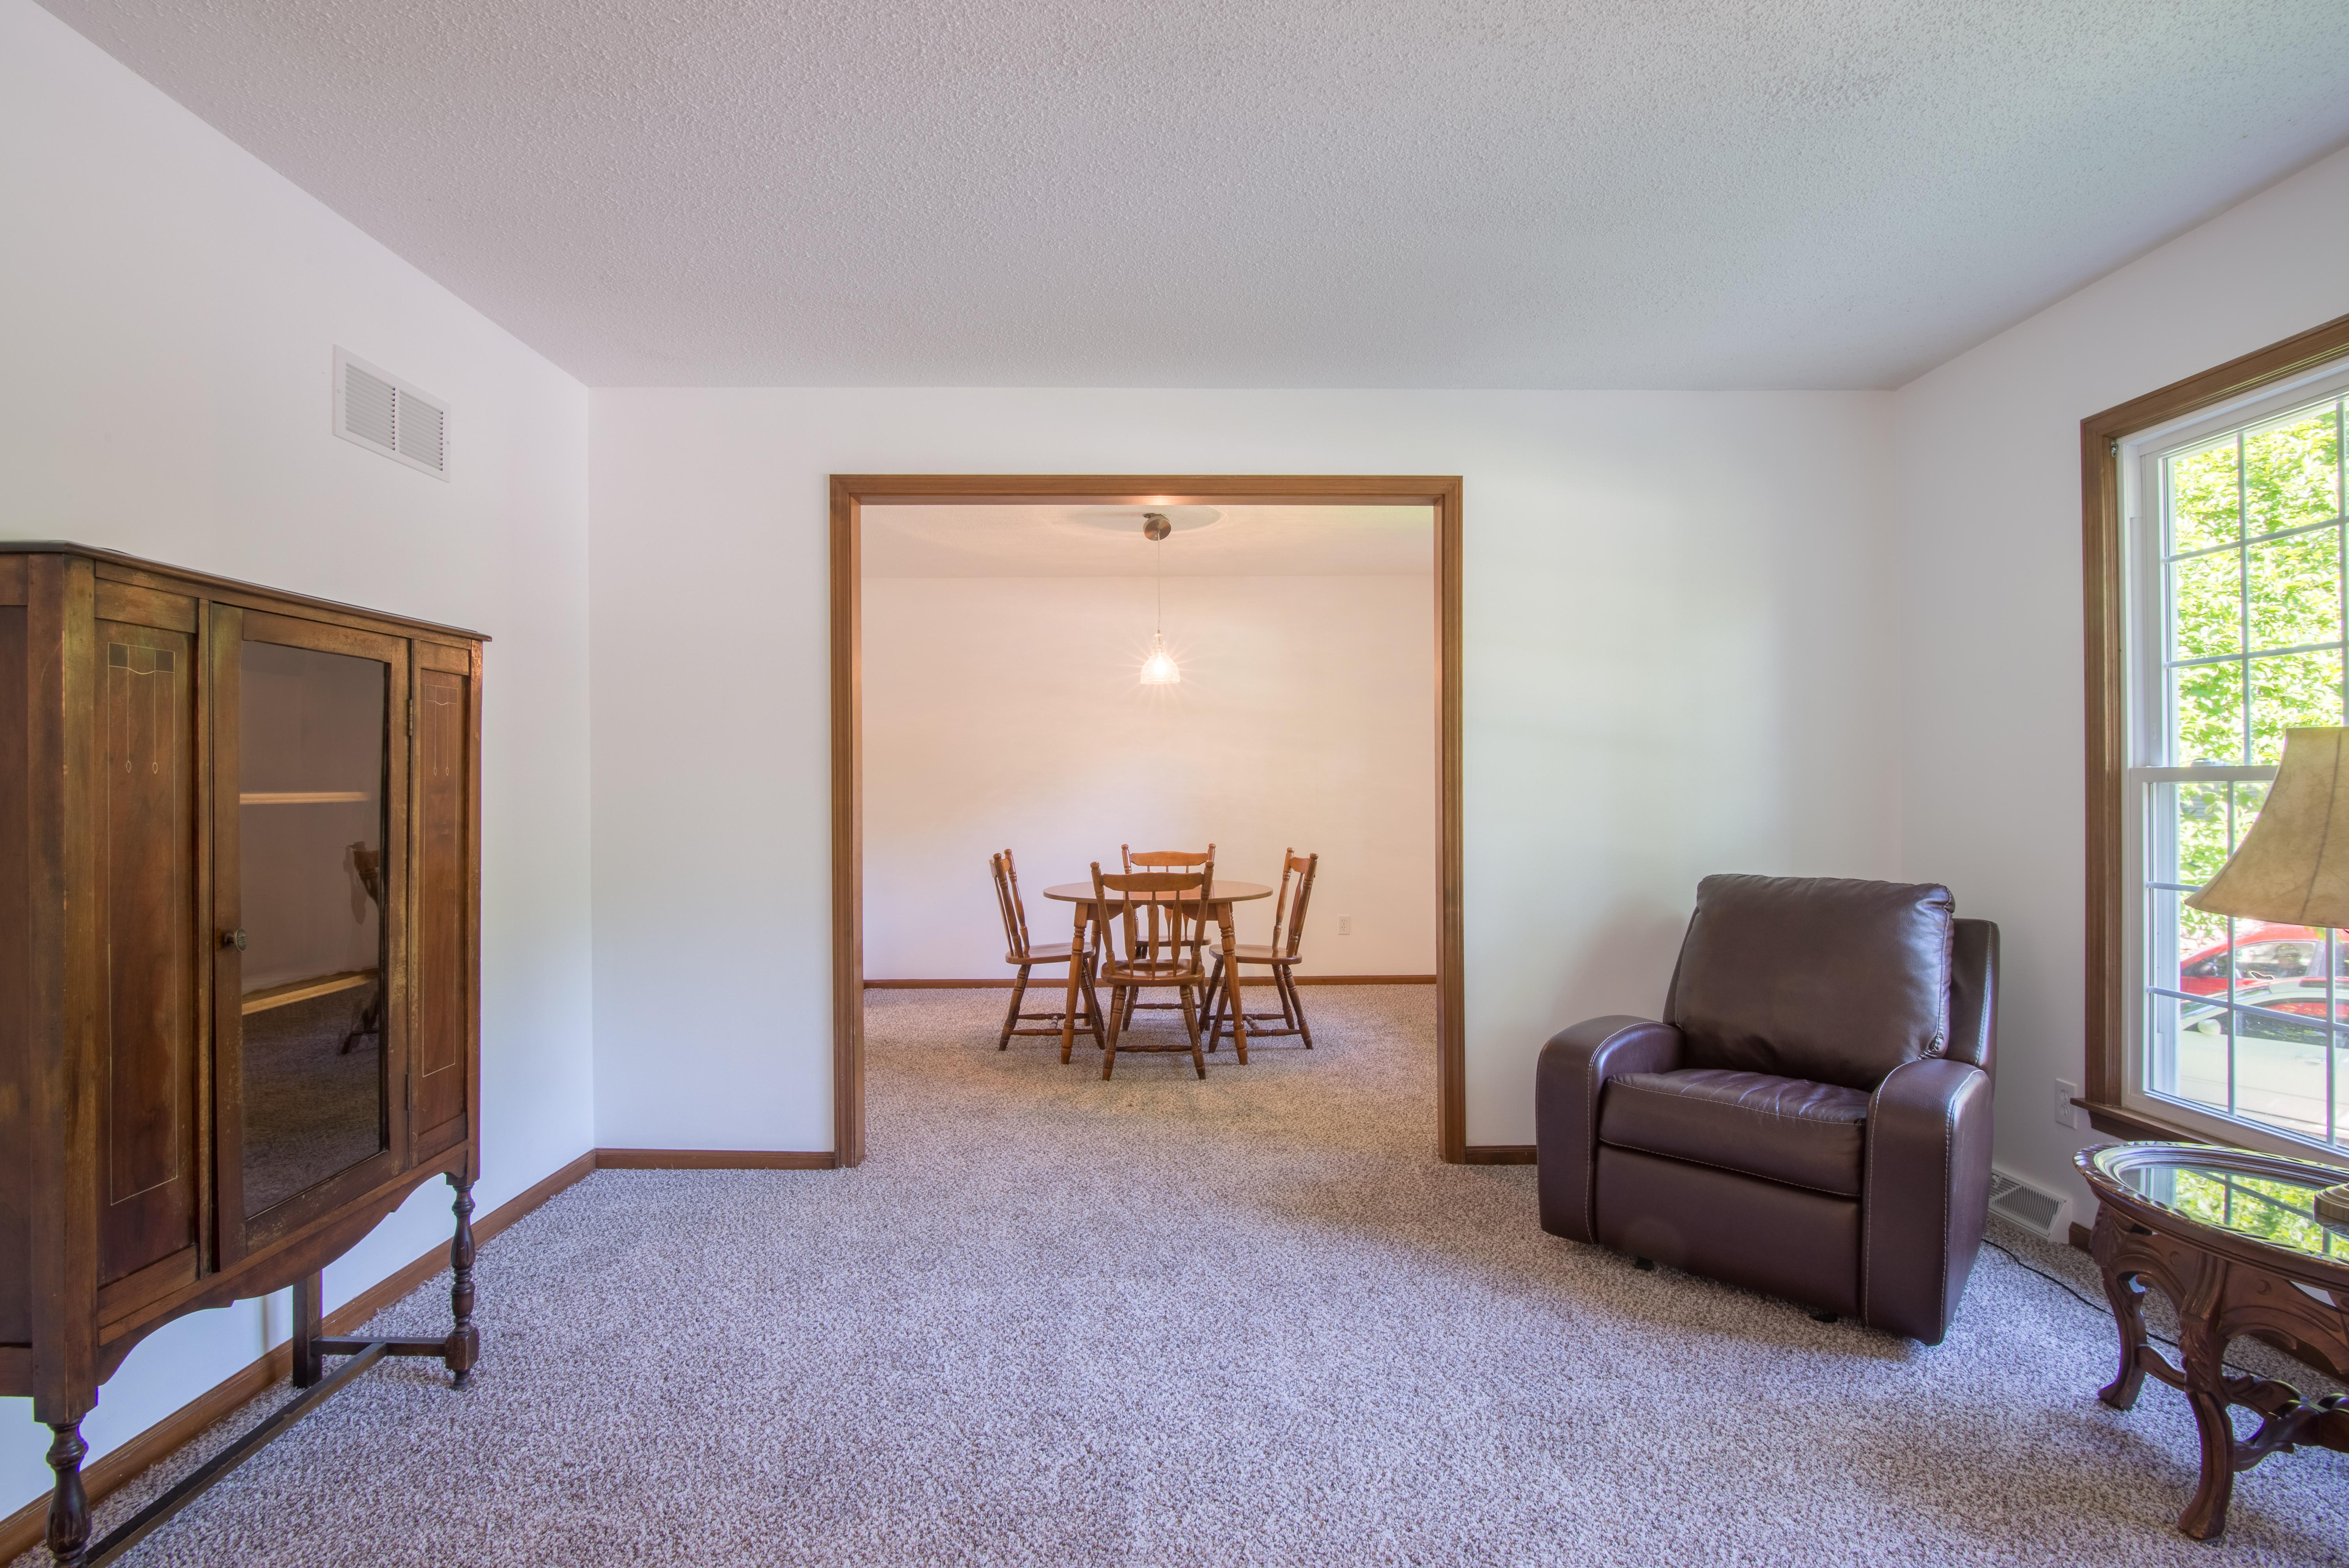 12109 W 60Th Terrace, Shawnee-12